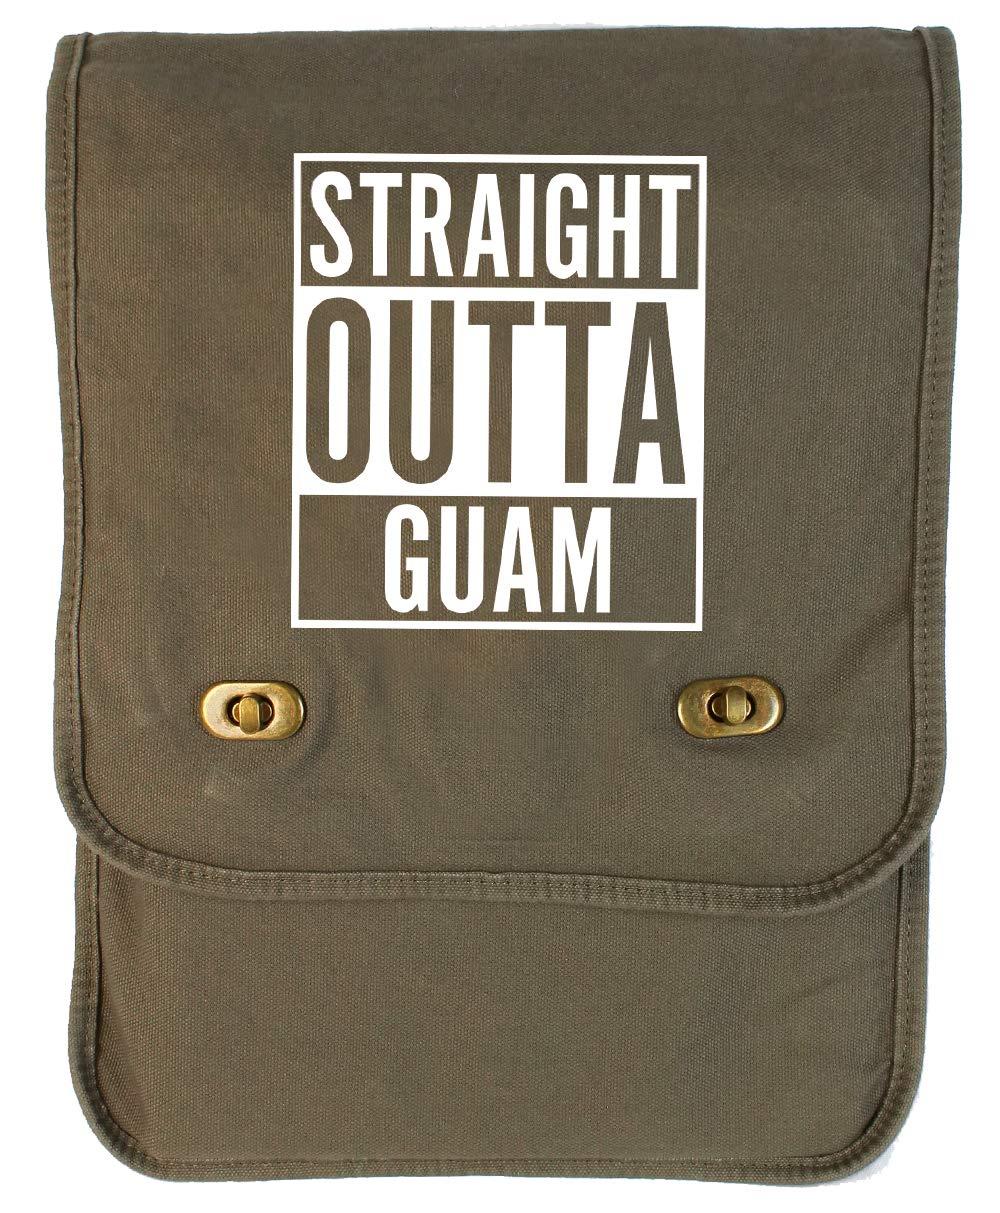 Tenacitee Straight Outta Guam Royal Blue Brushed Canvas Messenger Bag